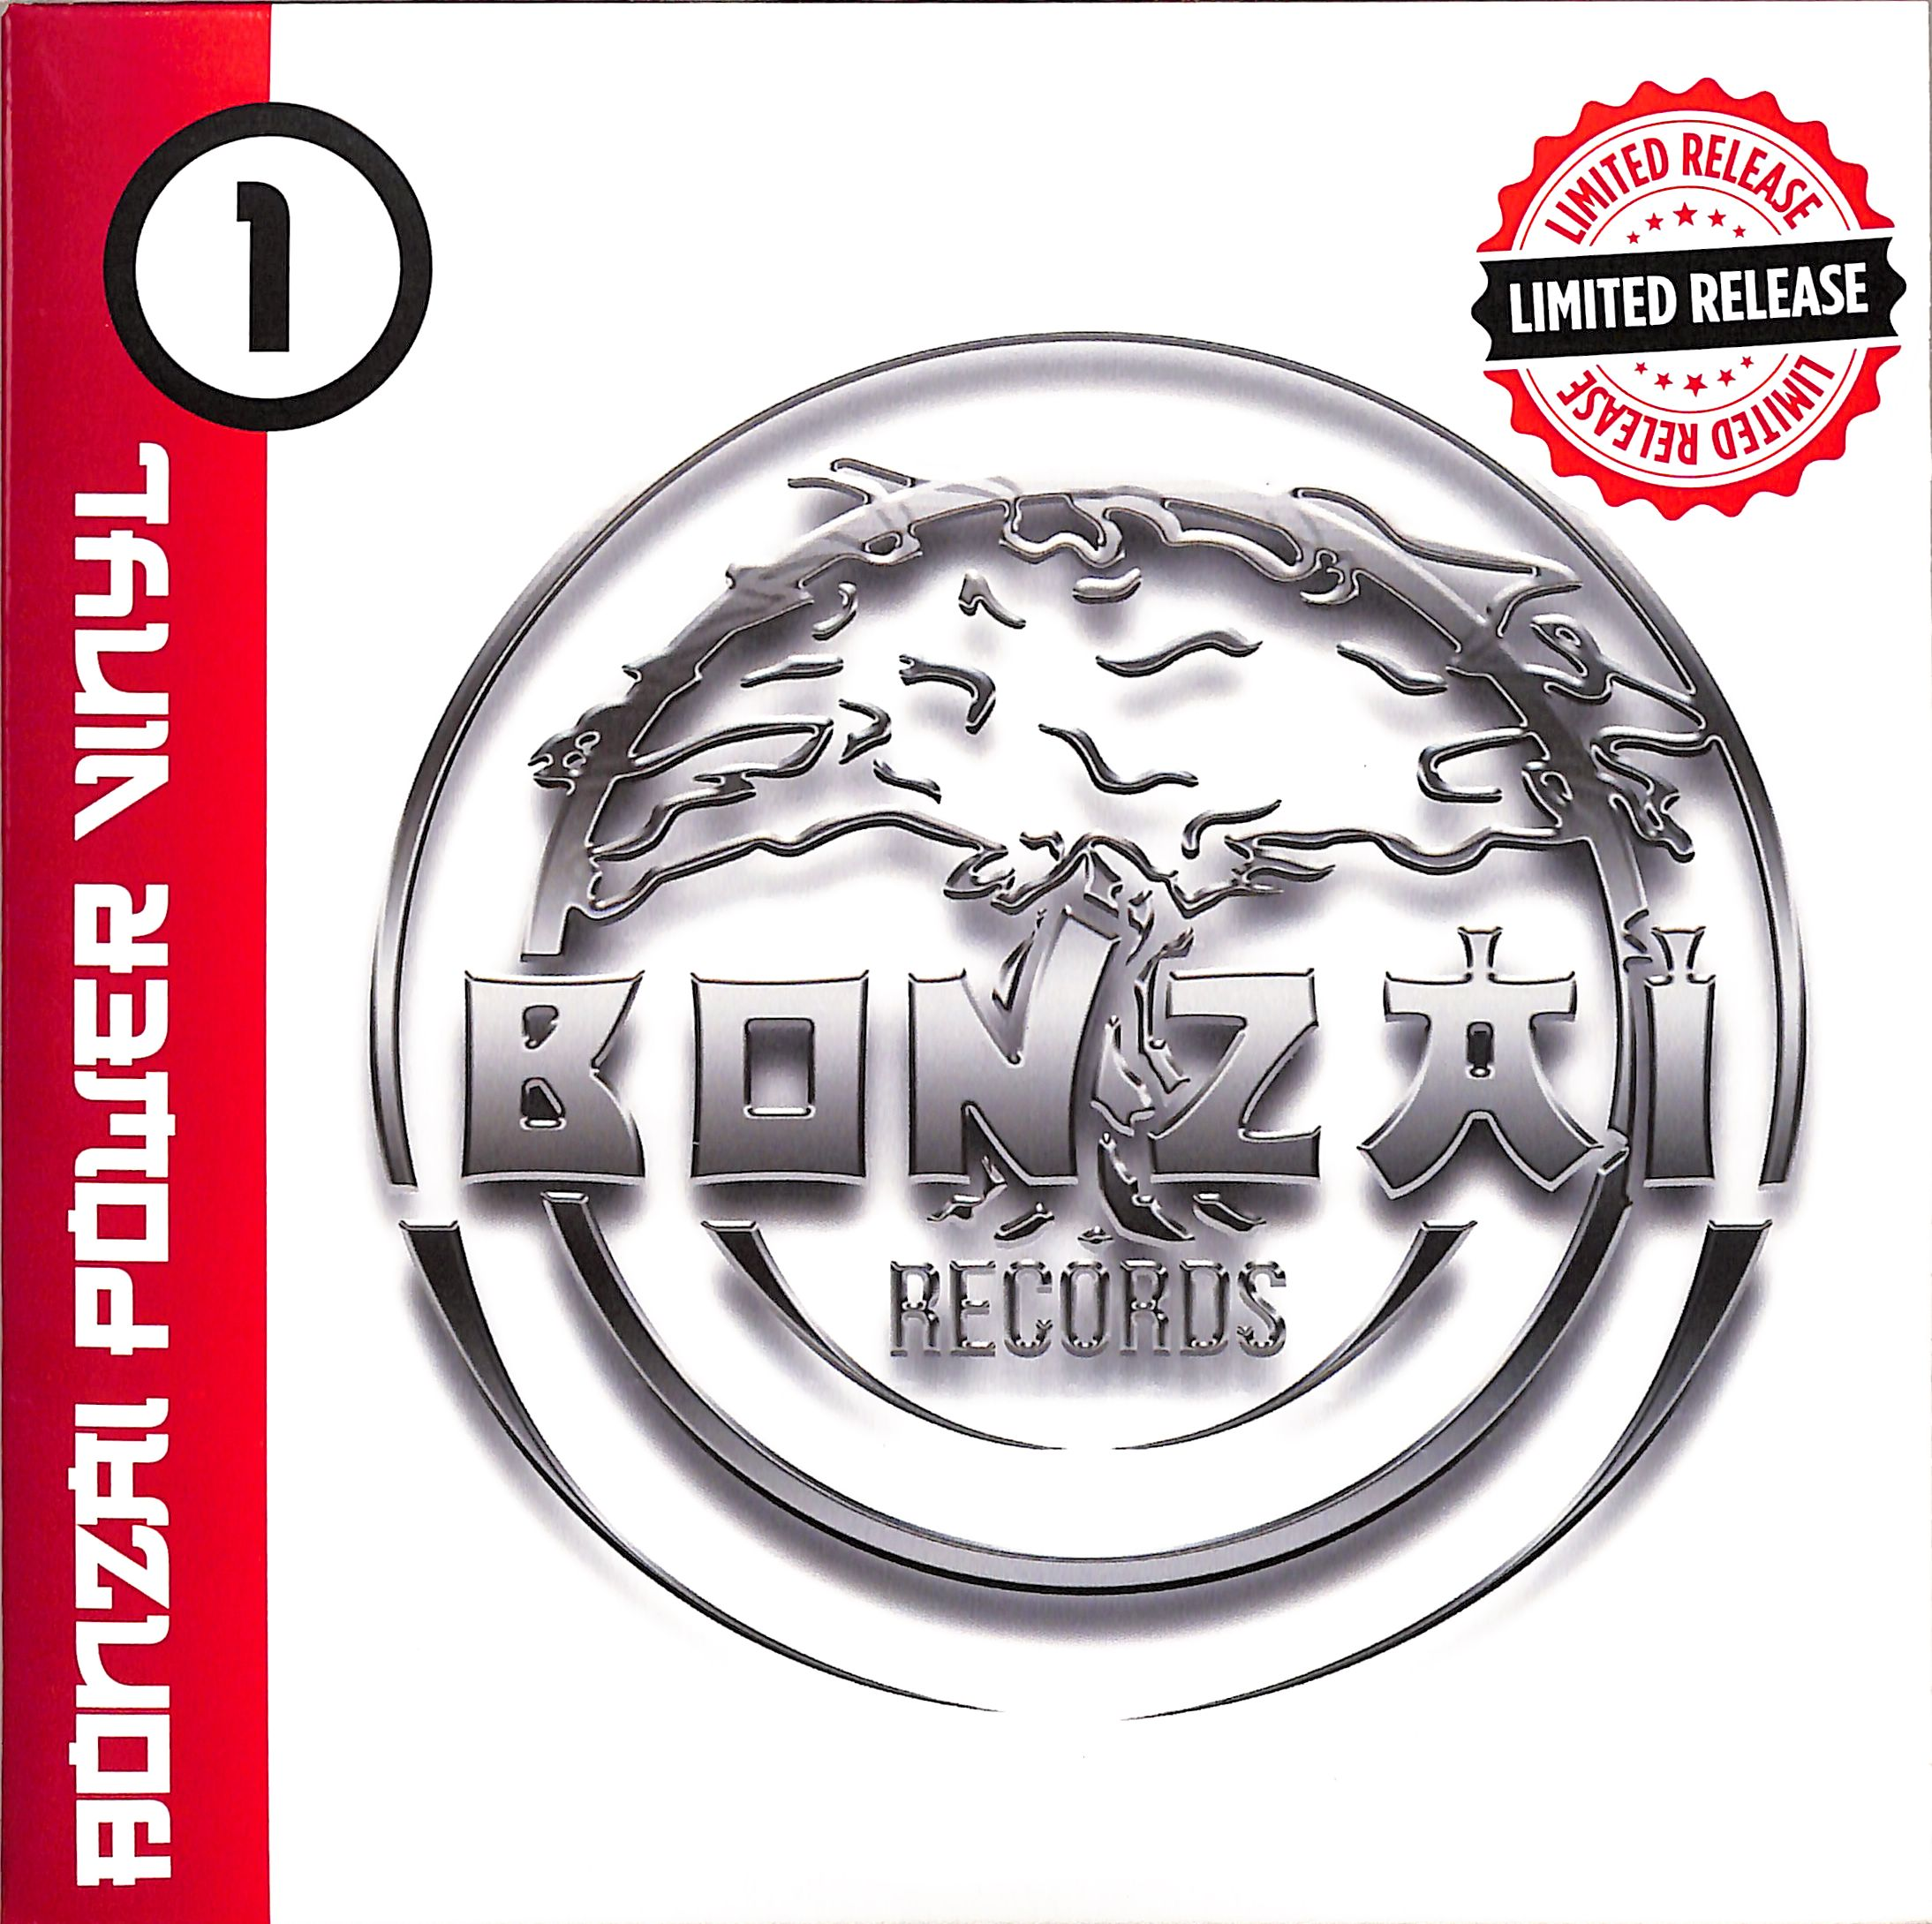 Bonzai Records VV - BONZAI POWER VINYL 1